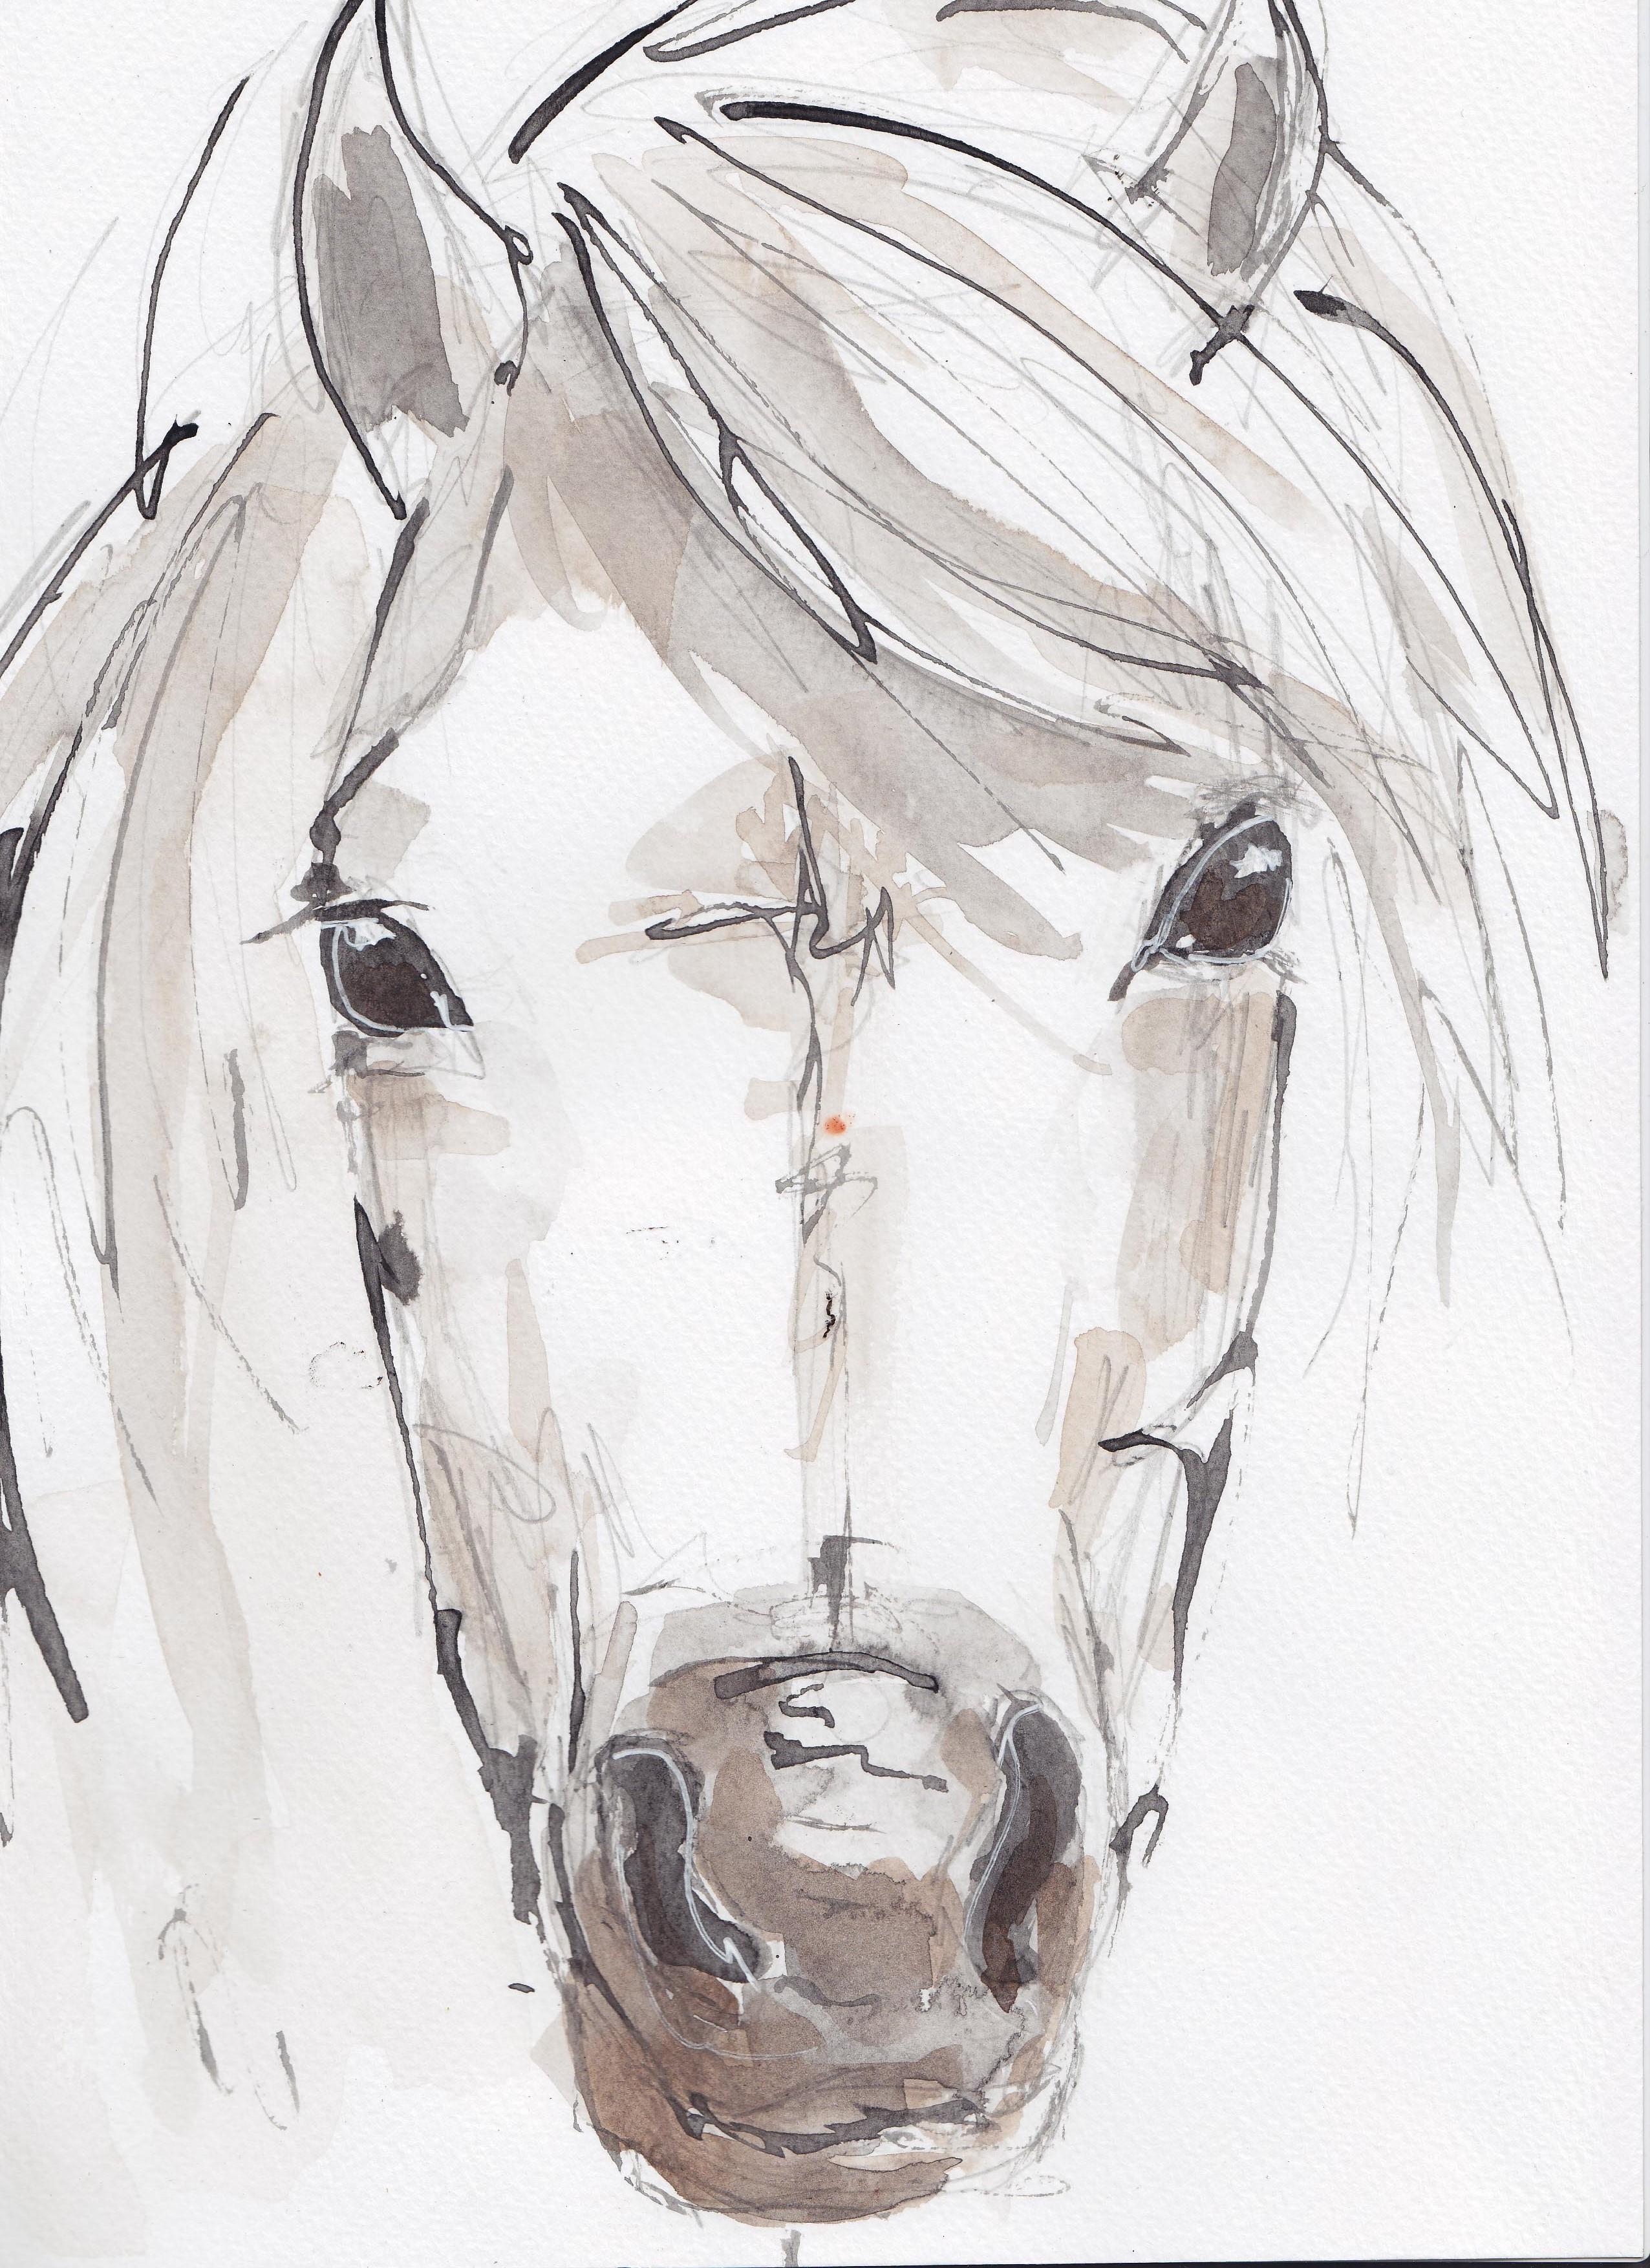 27 Welsh Pony copy.jpg